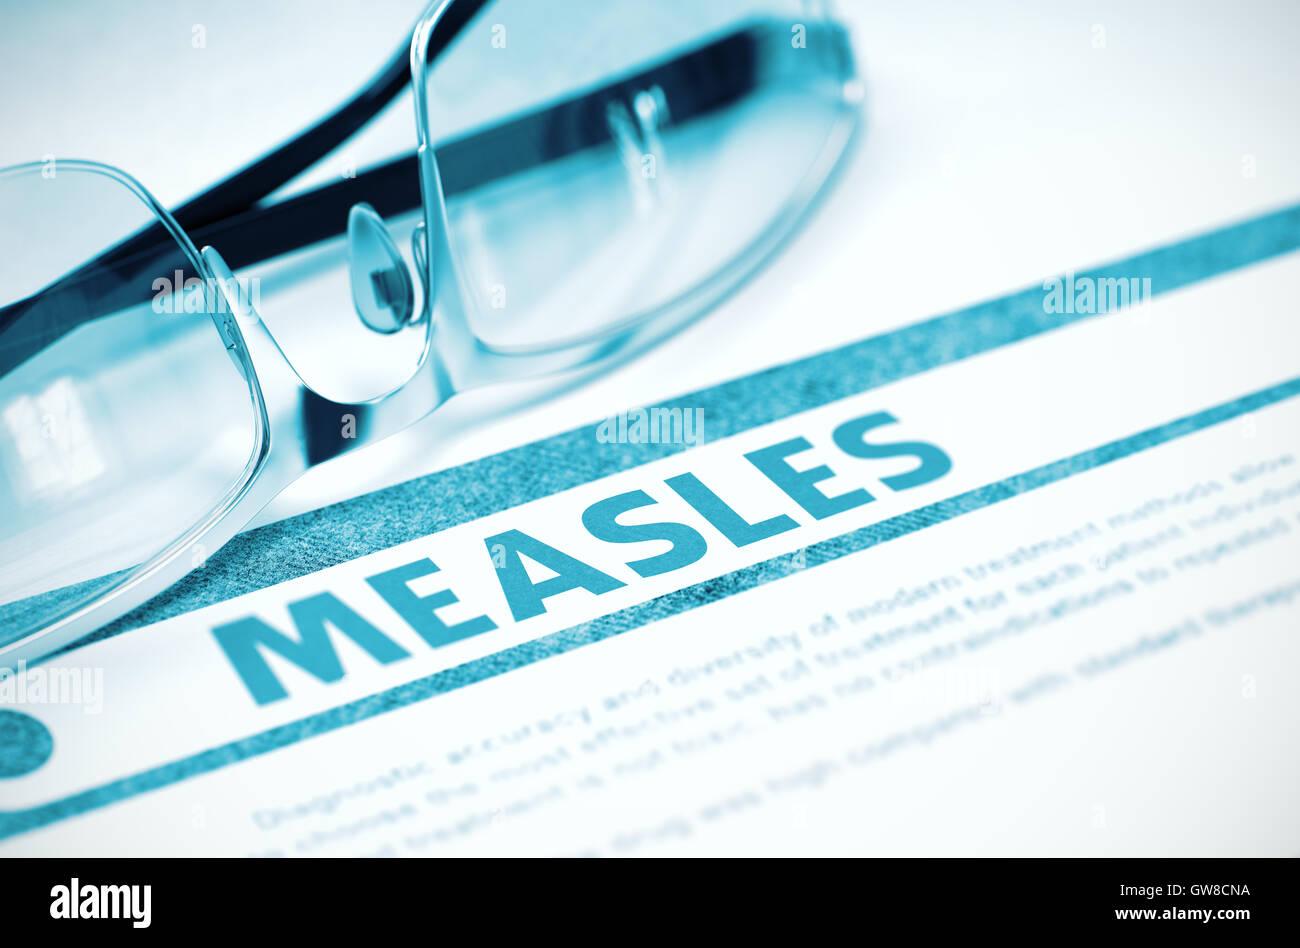 Diagnosis - Measles. Medical Concept. 3D Illustration. - Stock Image